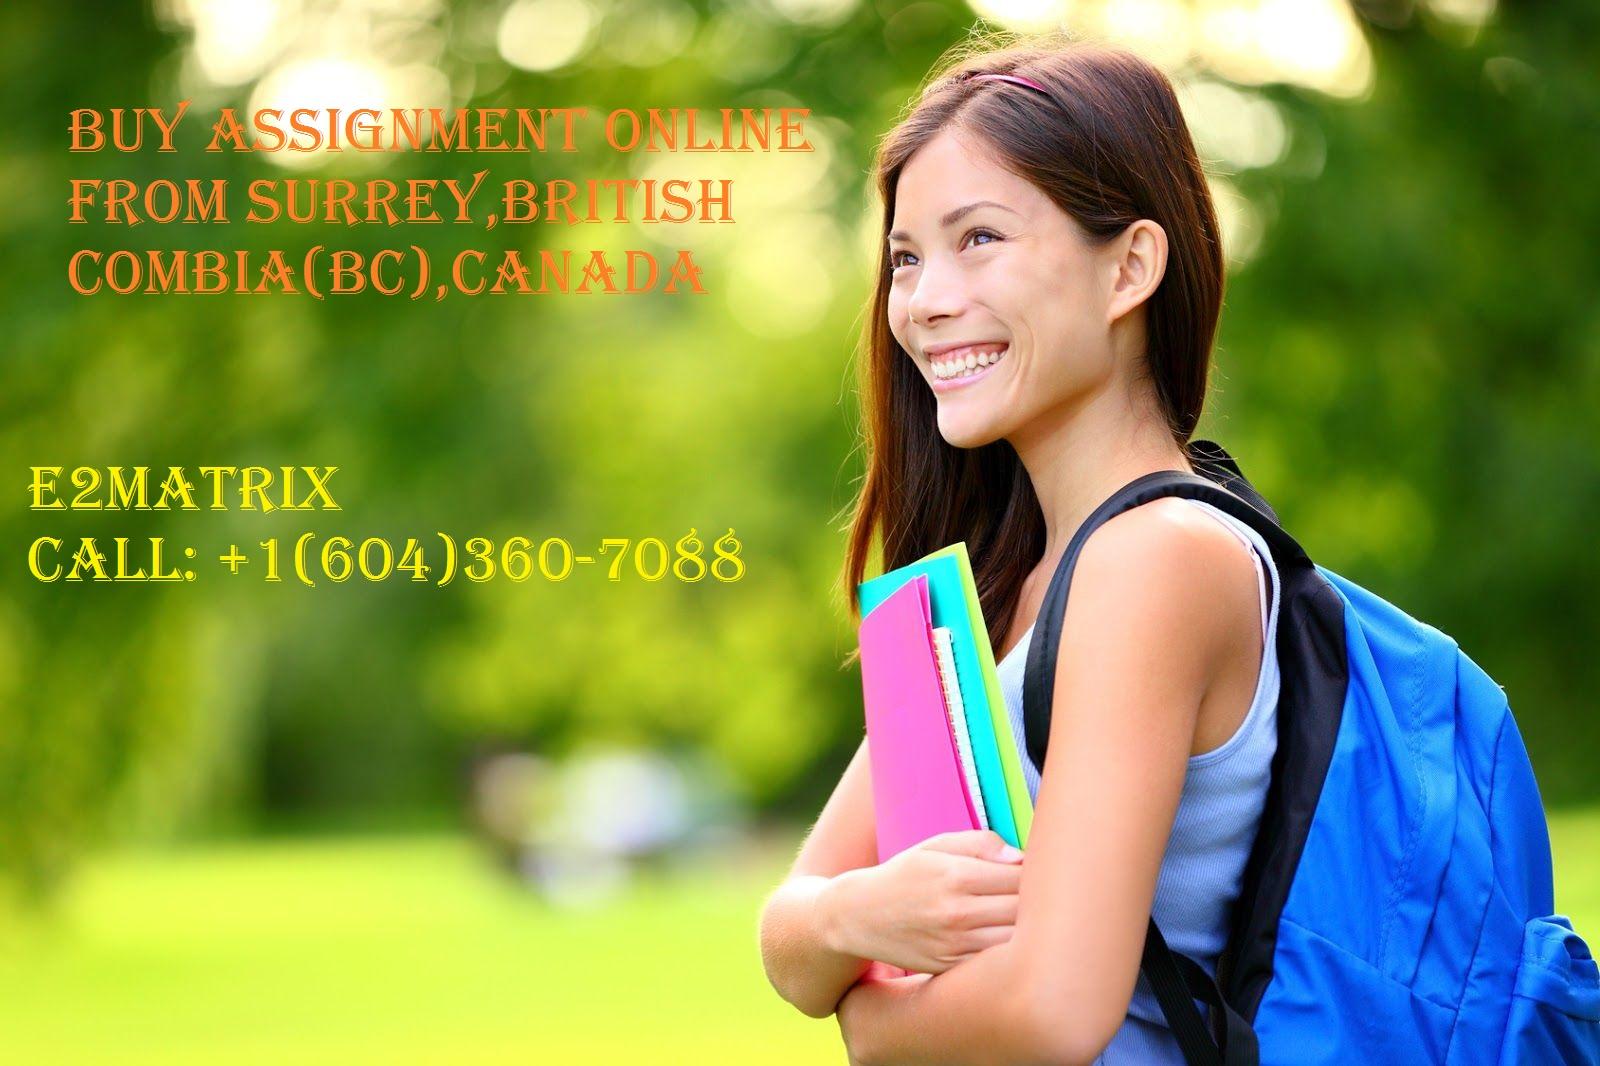 Benefits of Ordering Assignment Online